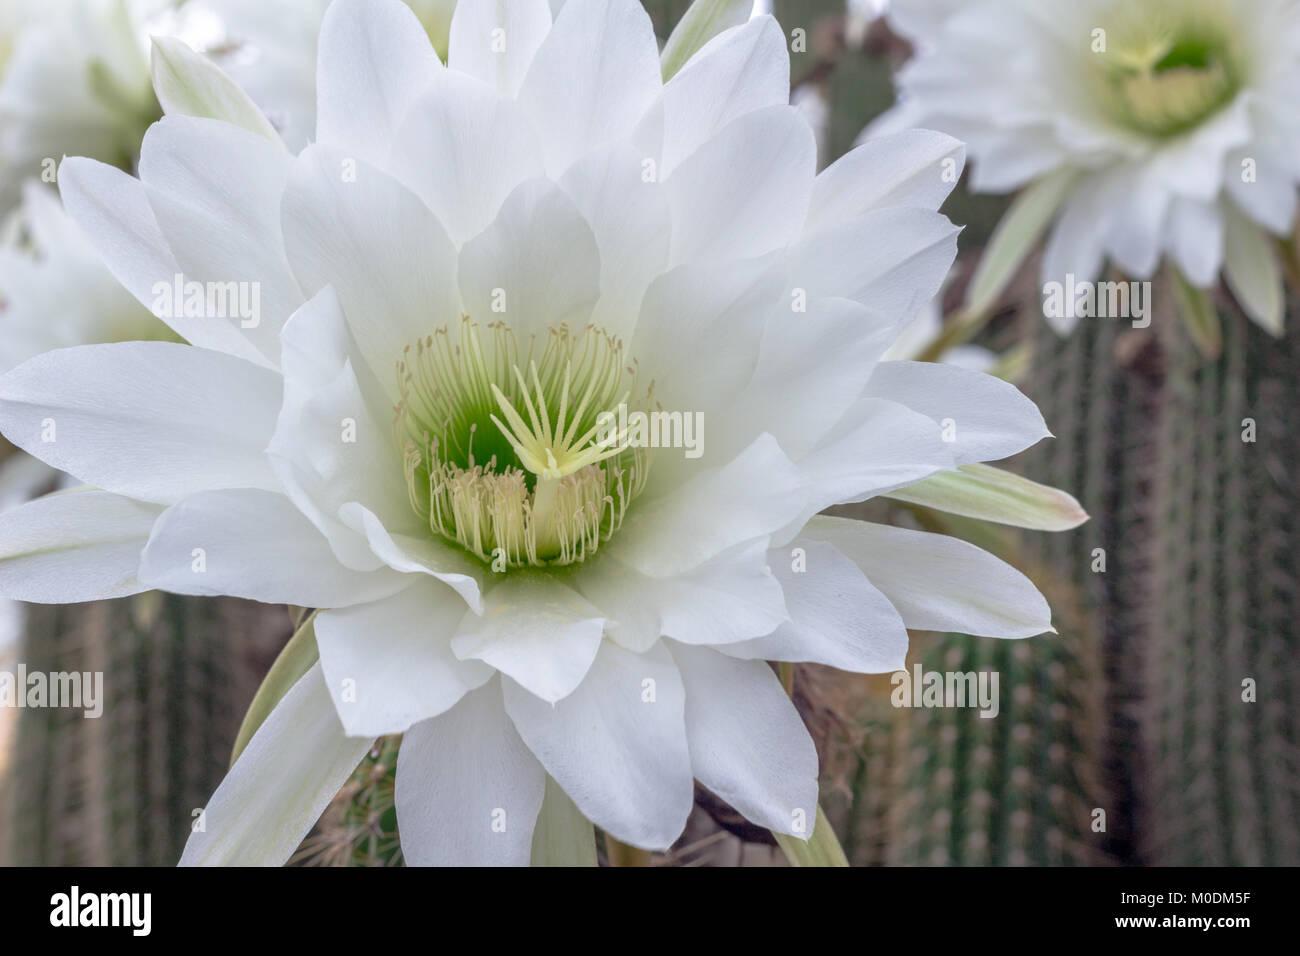 White Cactus Flower Stock Photos White Cactus Flower Stock Images